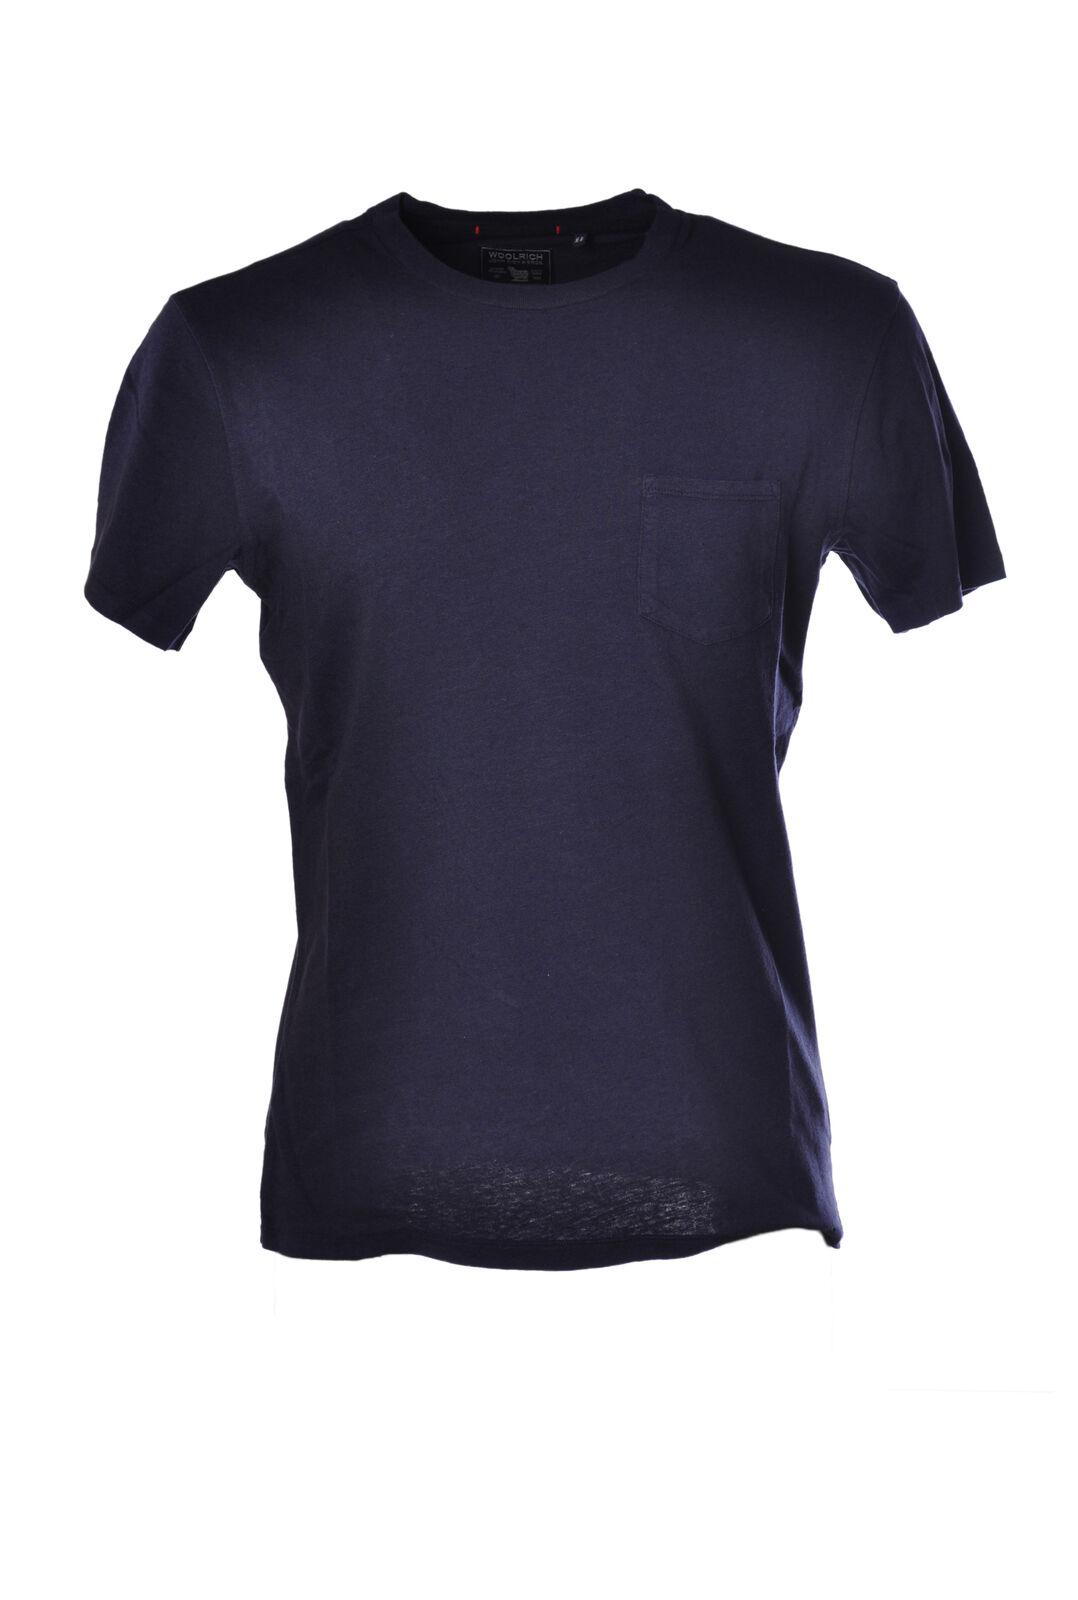 Woolrich  -  T - Male - Blau - 1801325N174436